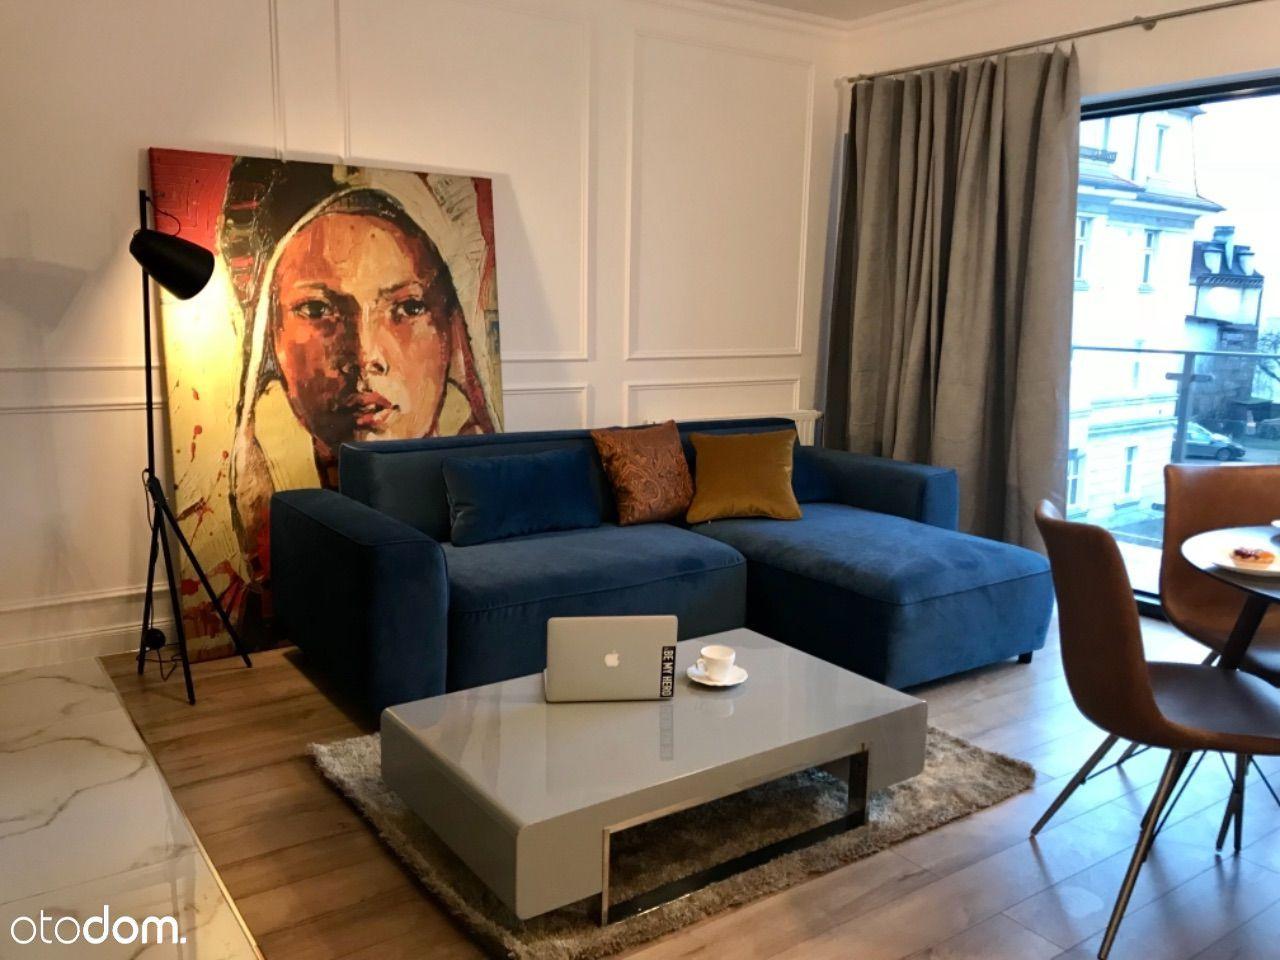 Designerski Apartament w Centrum, możliwa f-Vat